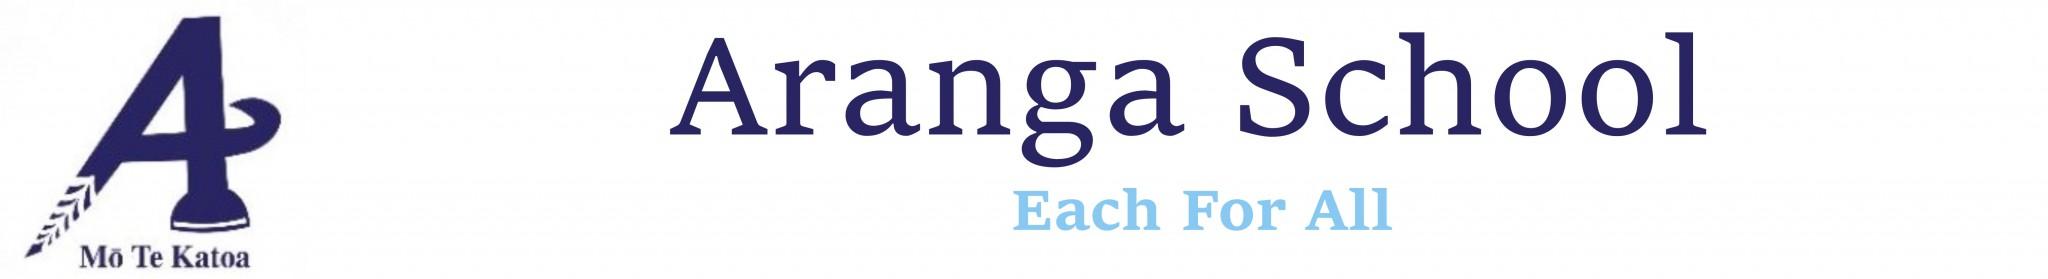 Aranga School Logo